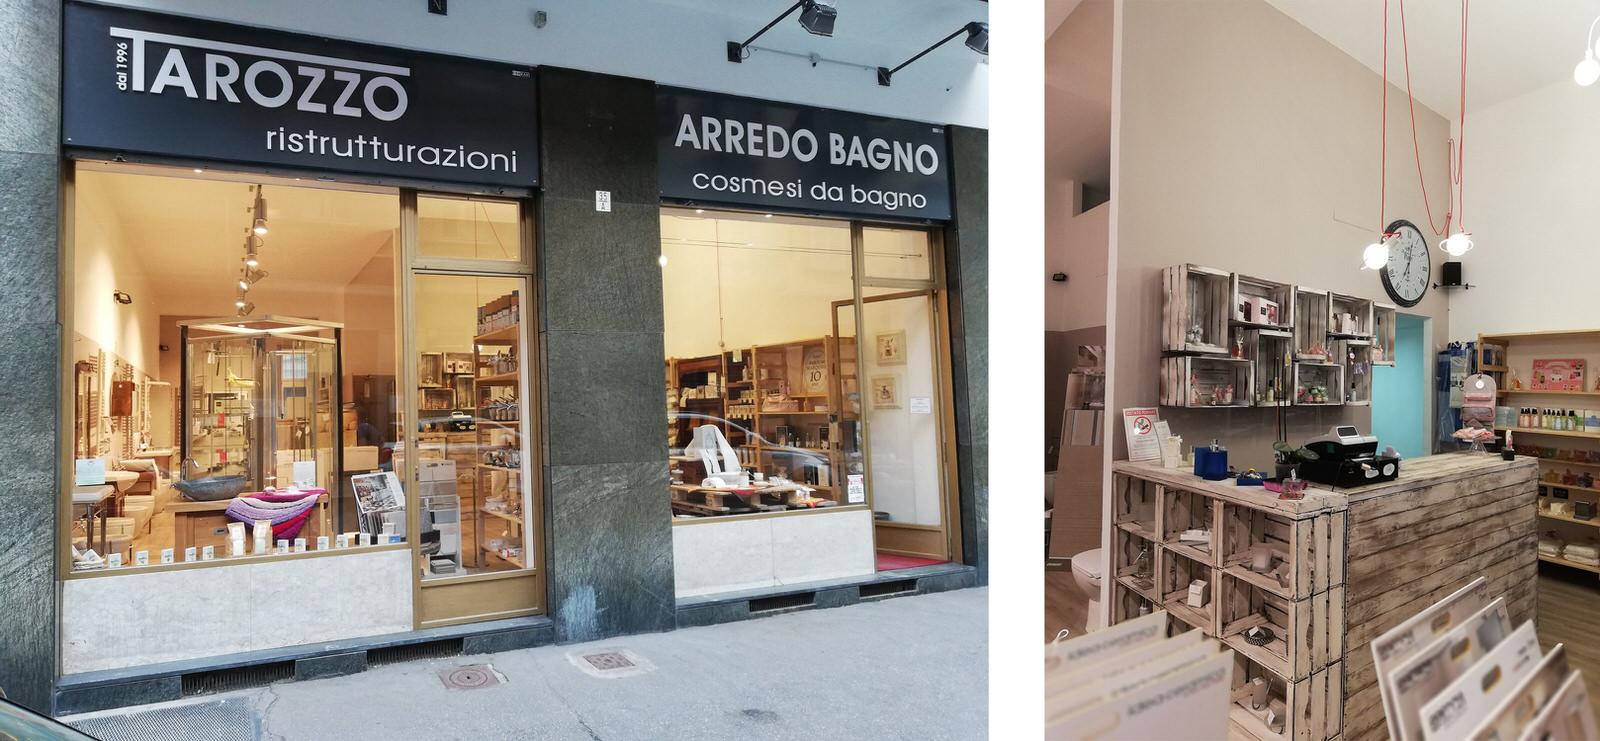 Vendita Arredo Bagno Torino.Vendita Piastrelle Torino Impresa Edile Tarozzo Impresa Edile